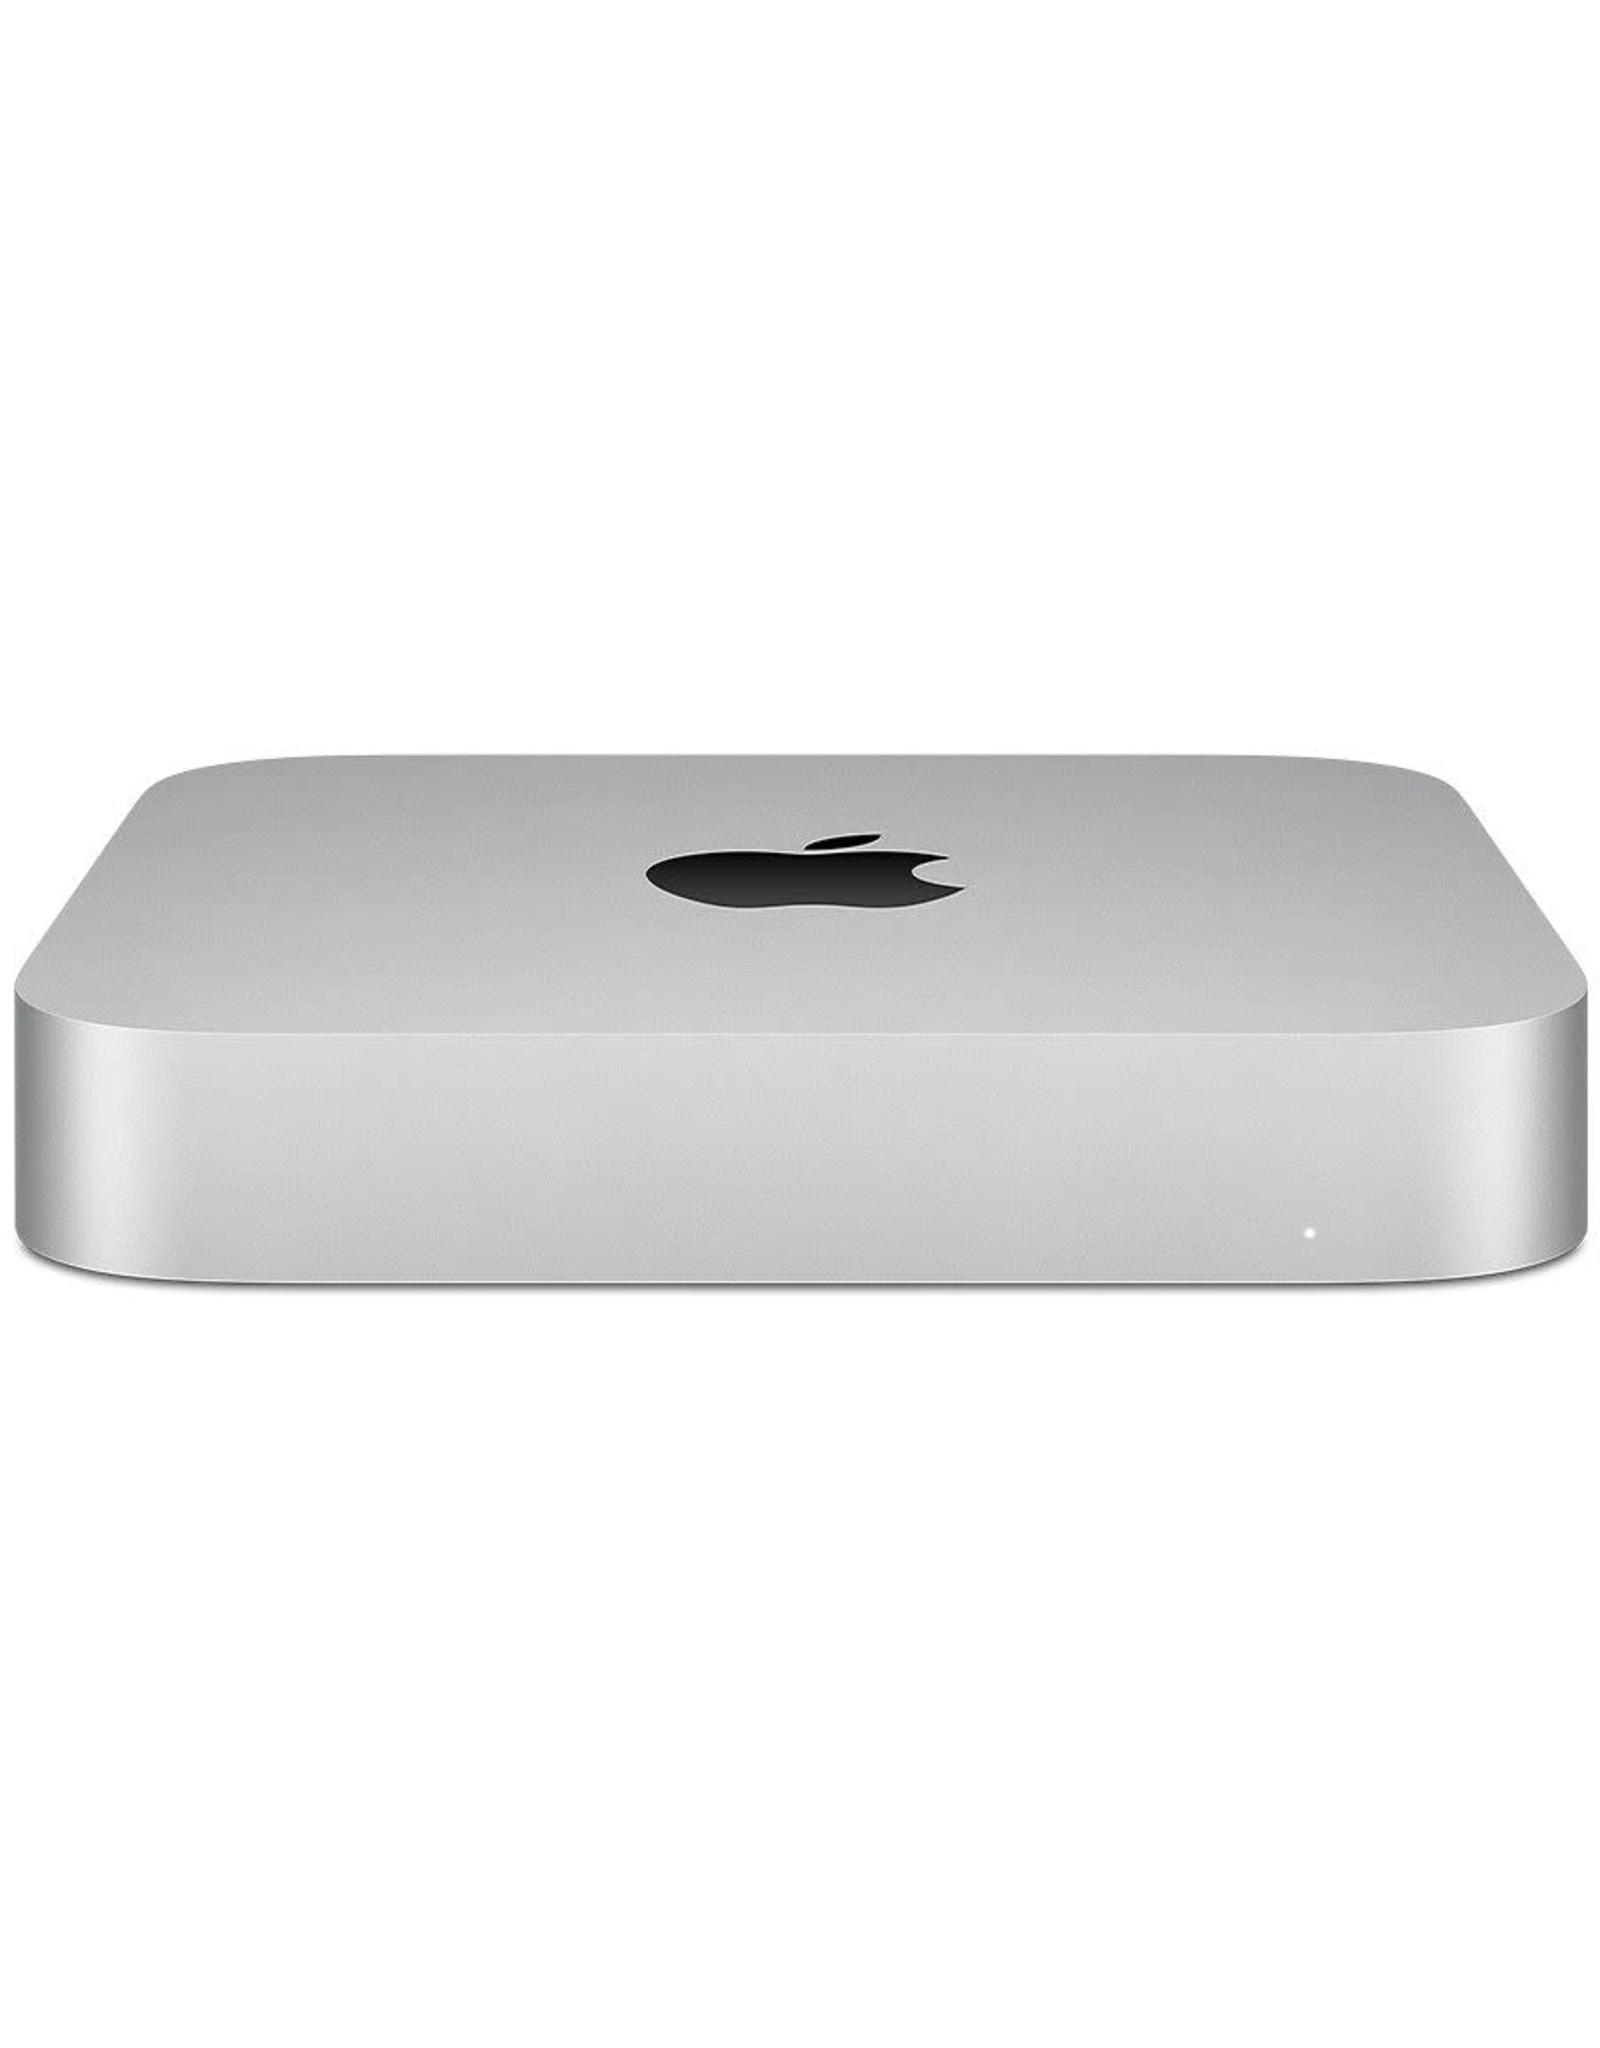 Apple Mac mini Apple M1 with 8‑Core CPU and 8‑Core GPU